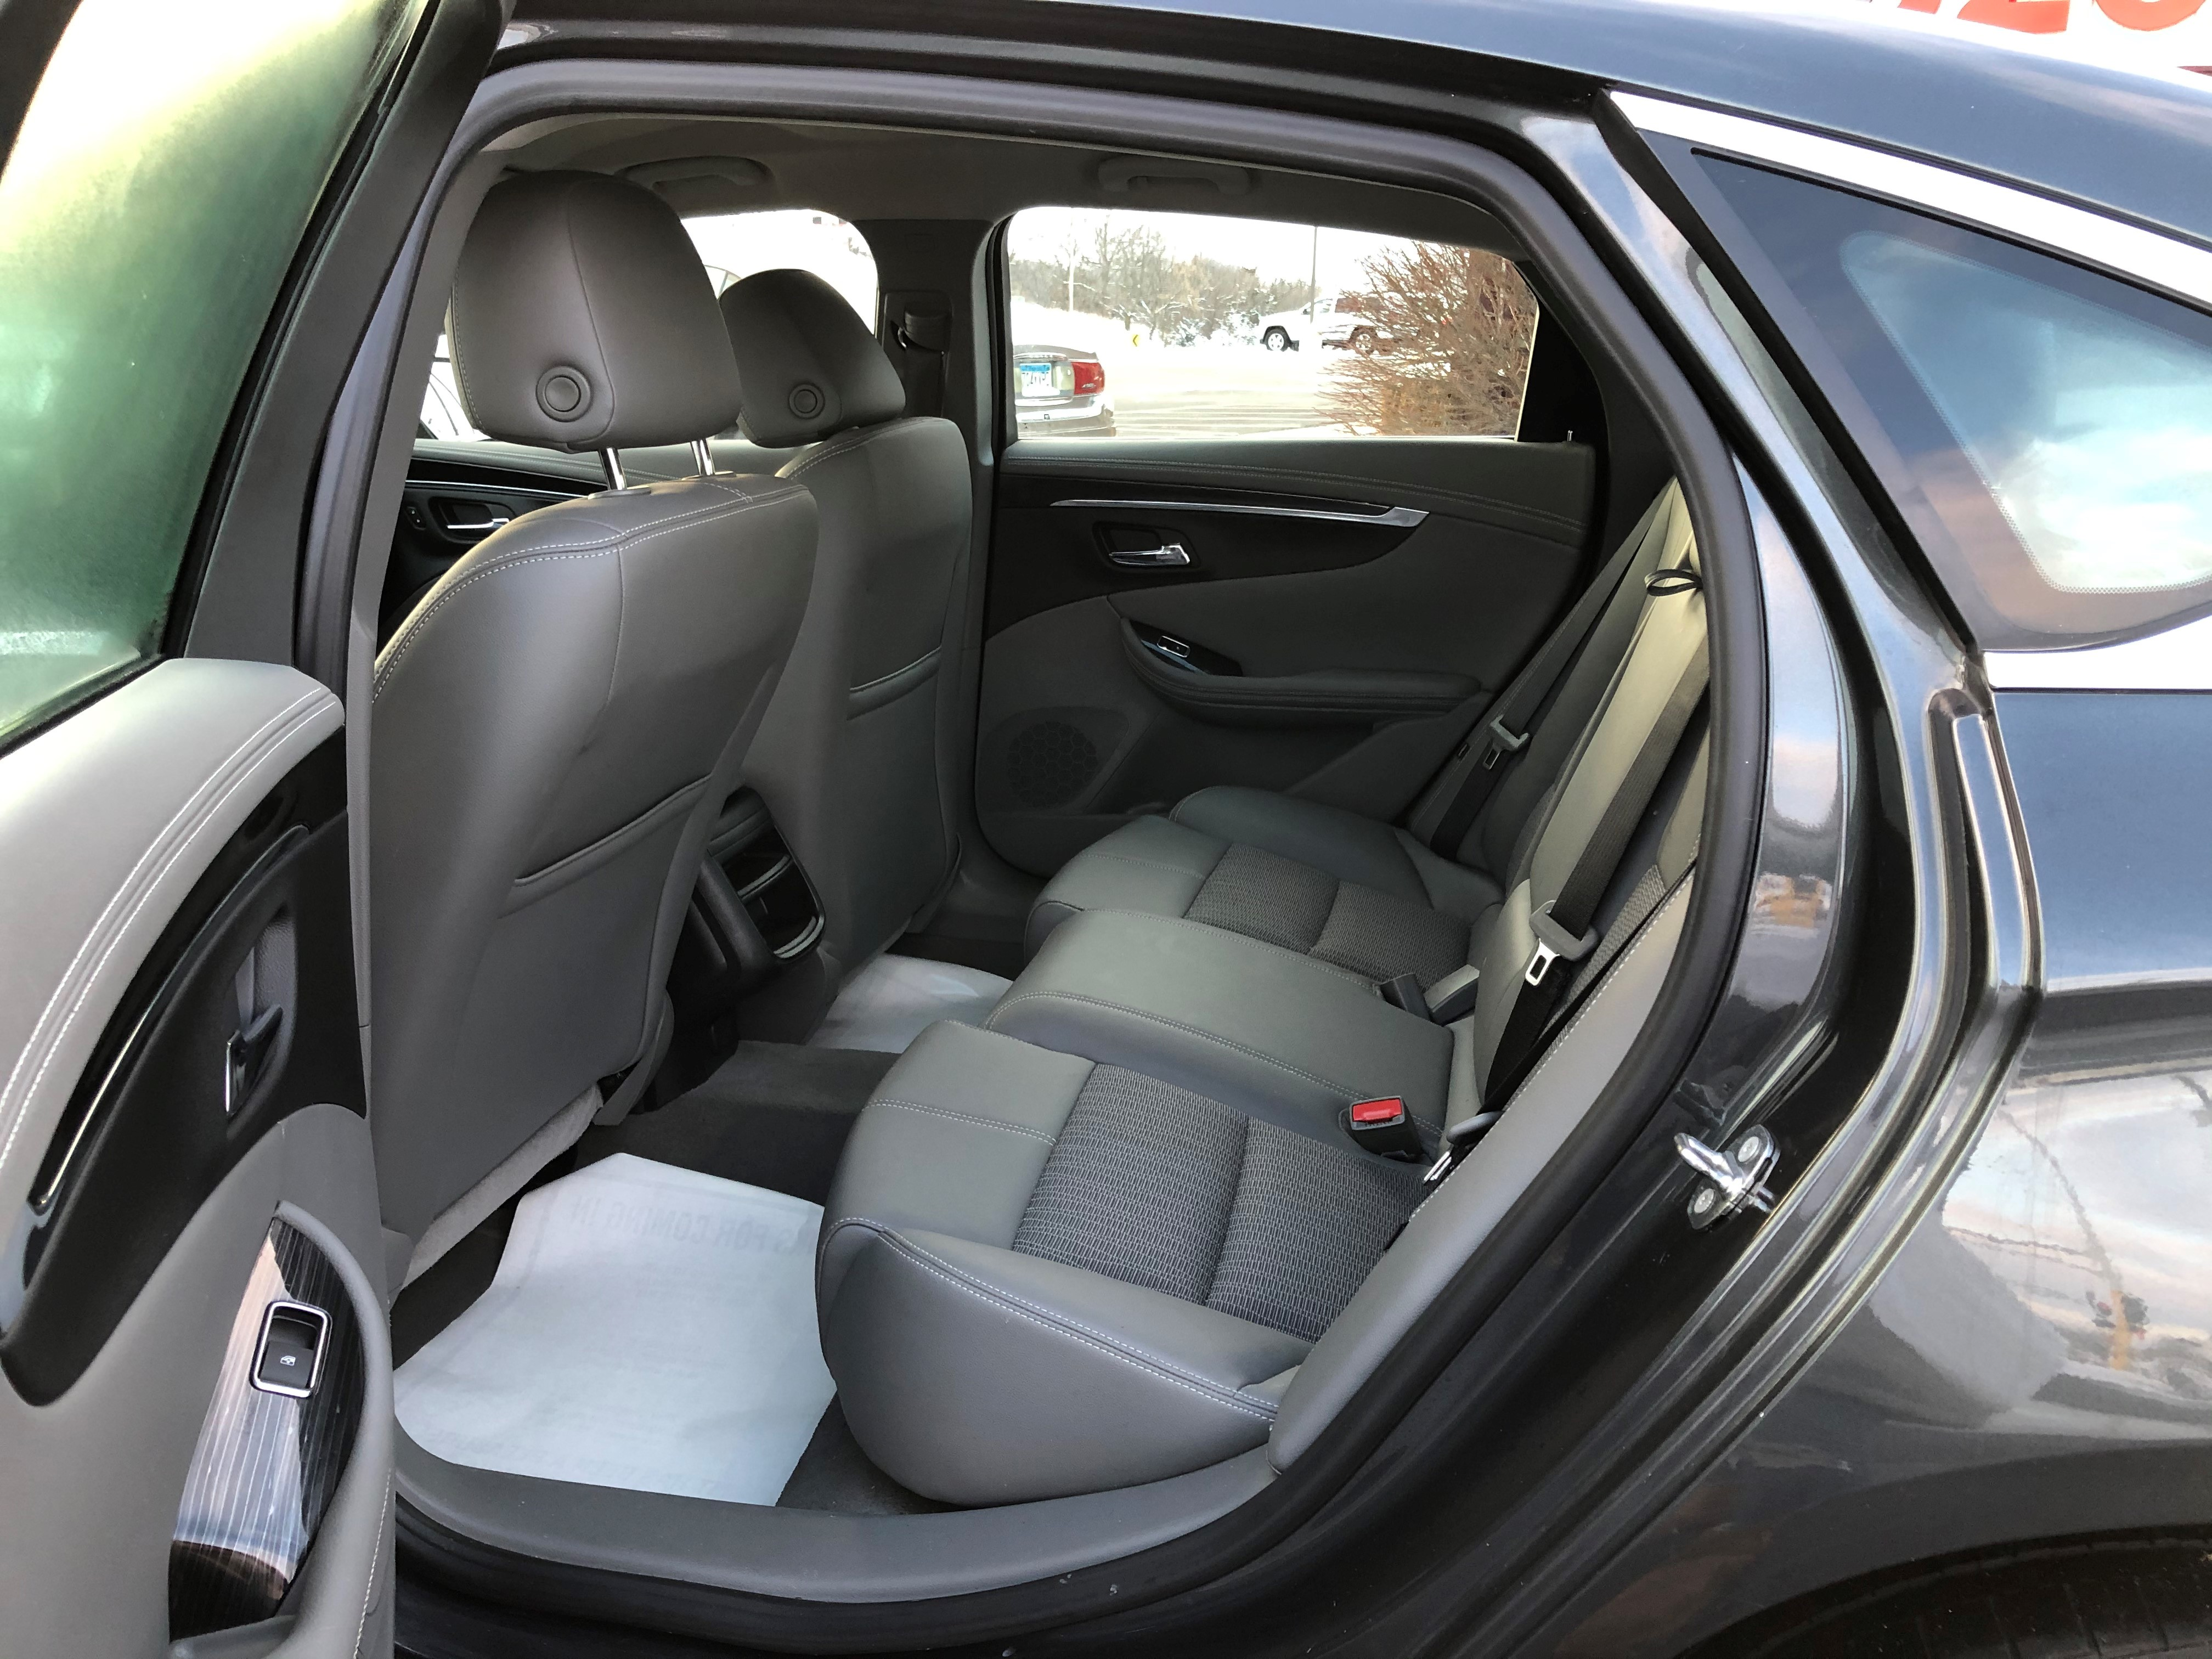 used vehicle - Sedan CHEVROLET IMPALA 2018